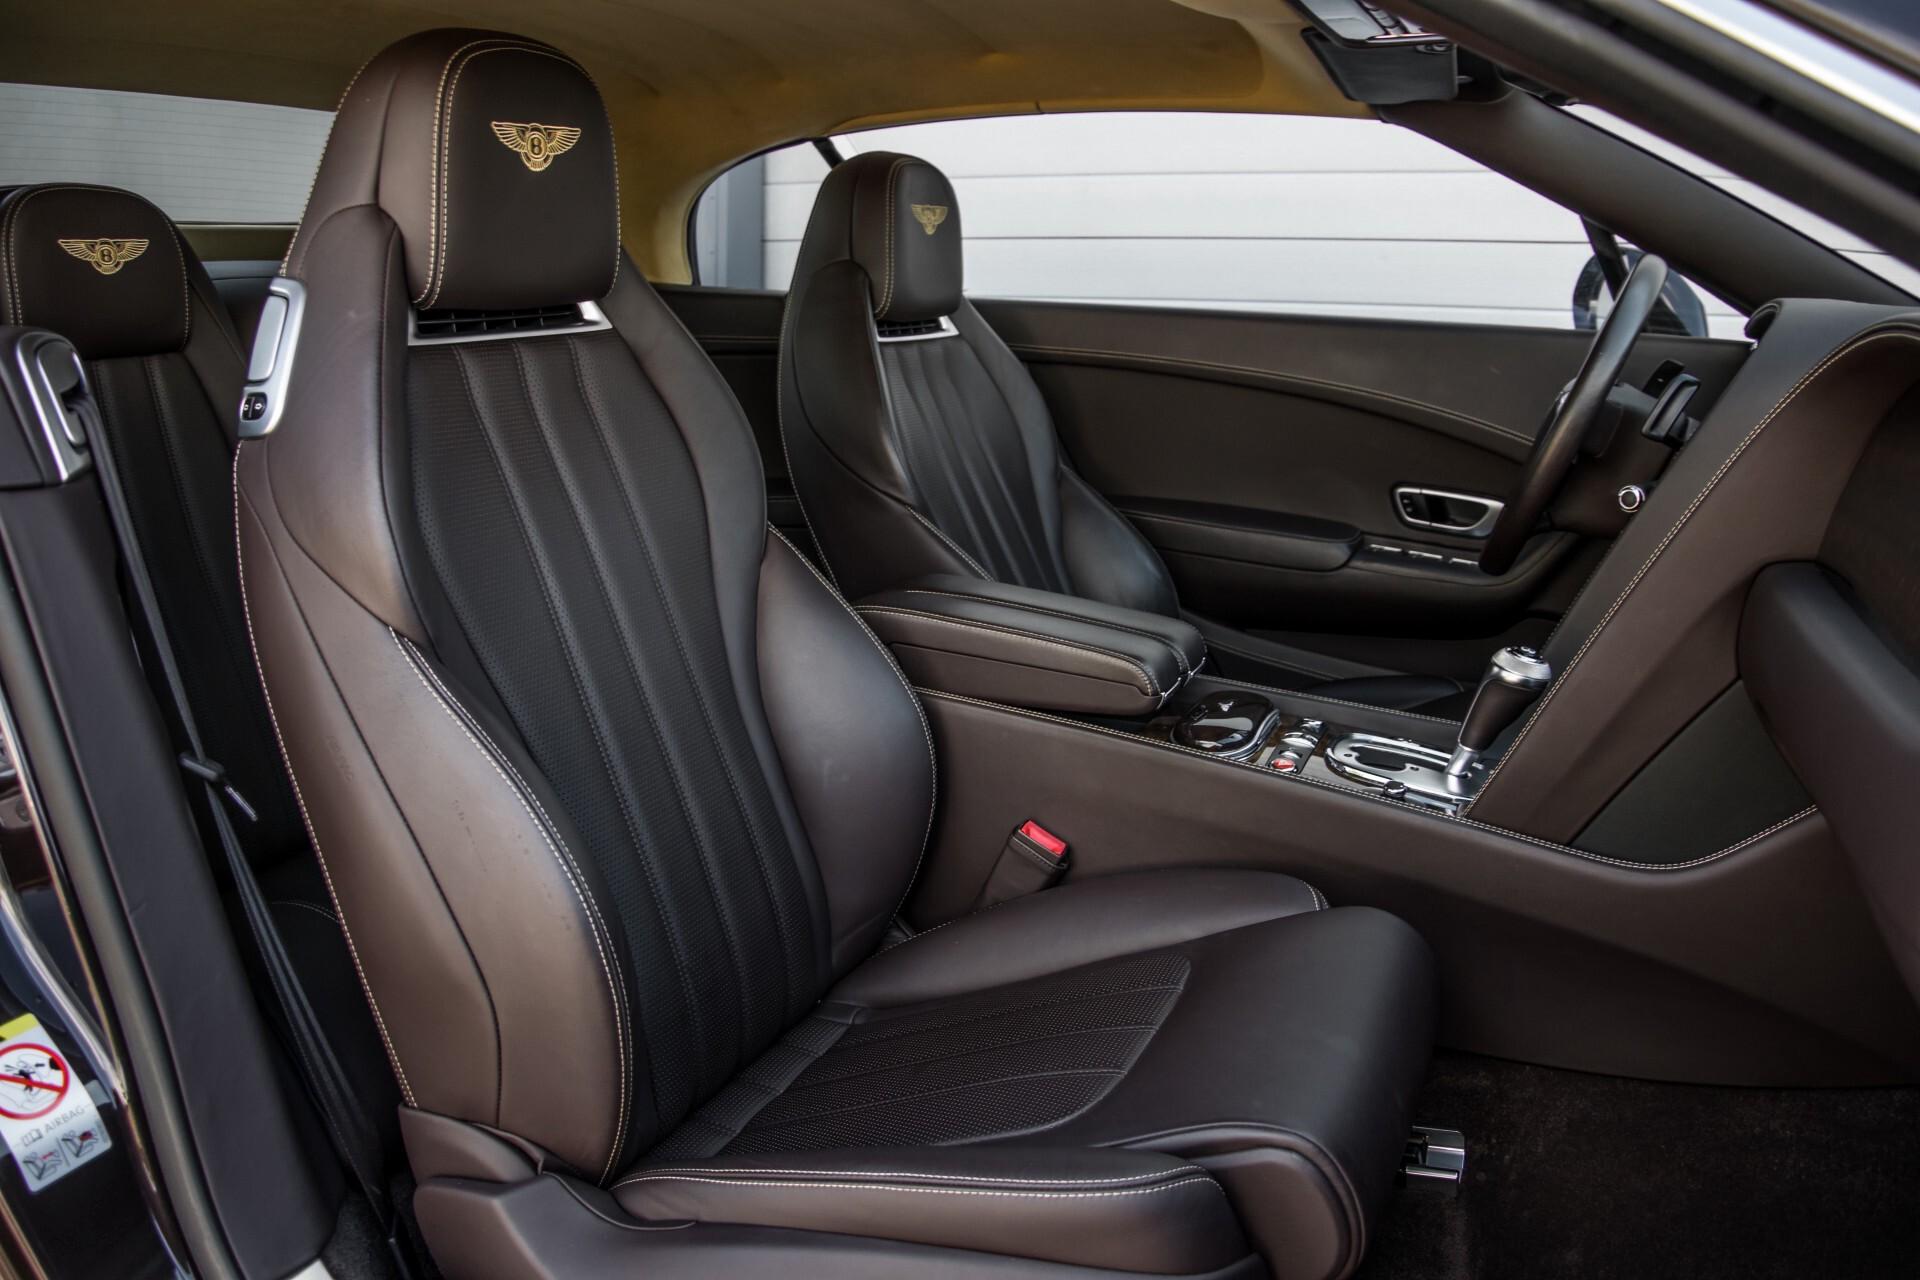 Bentley Continental GT 4.0 V8 GTC Aut7 Havannabruin Foto 6